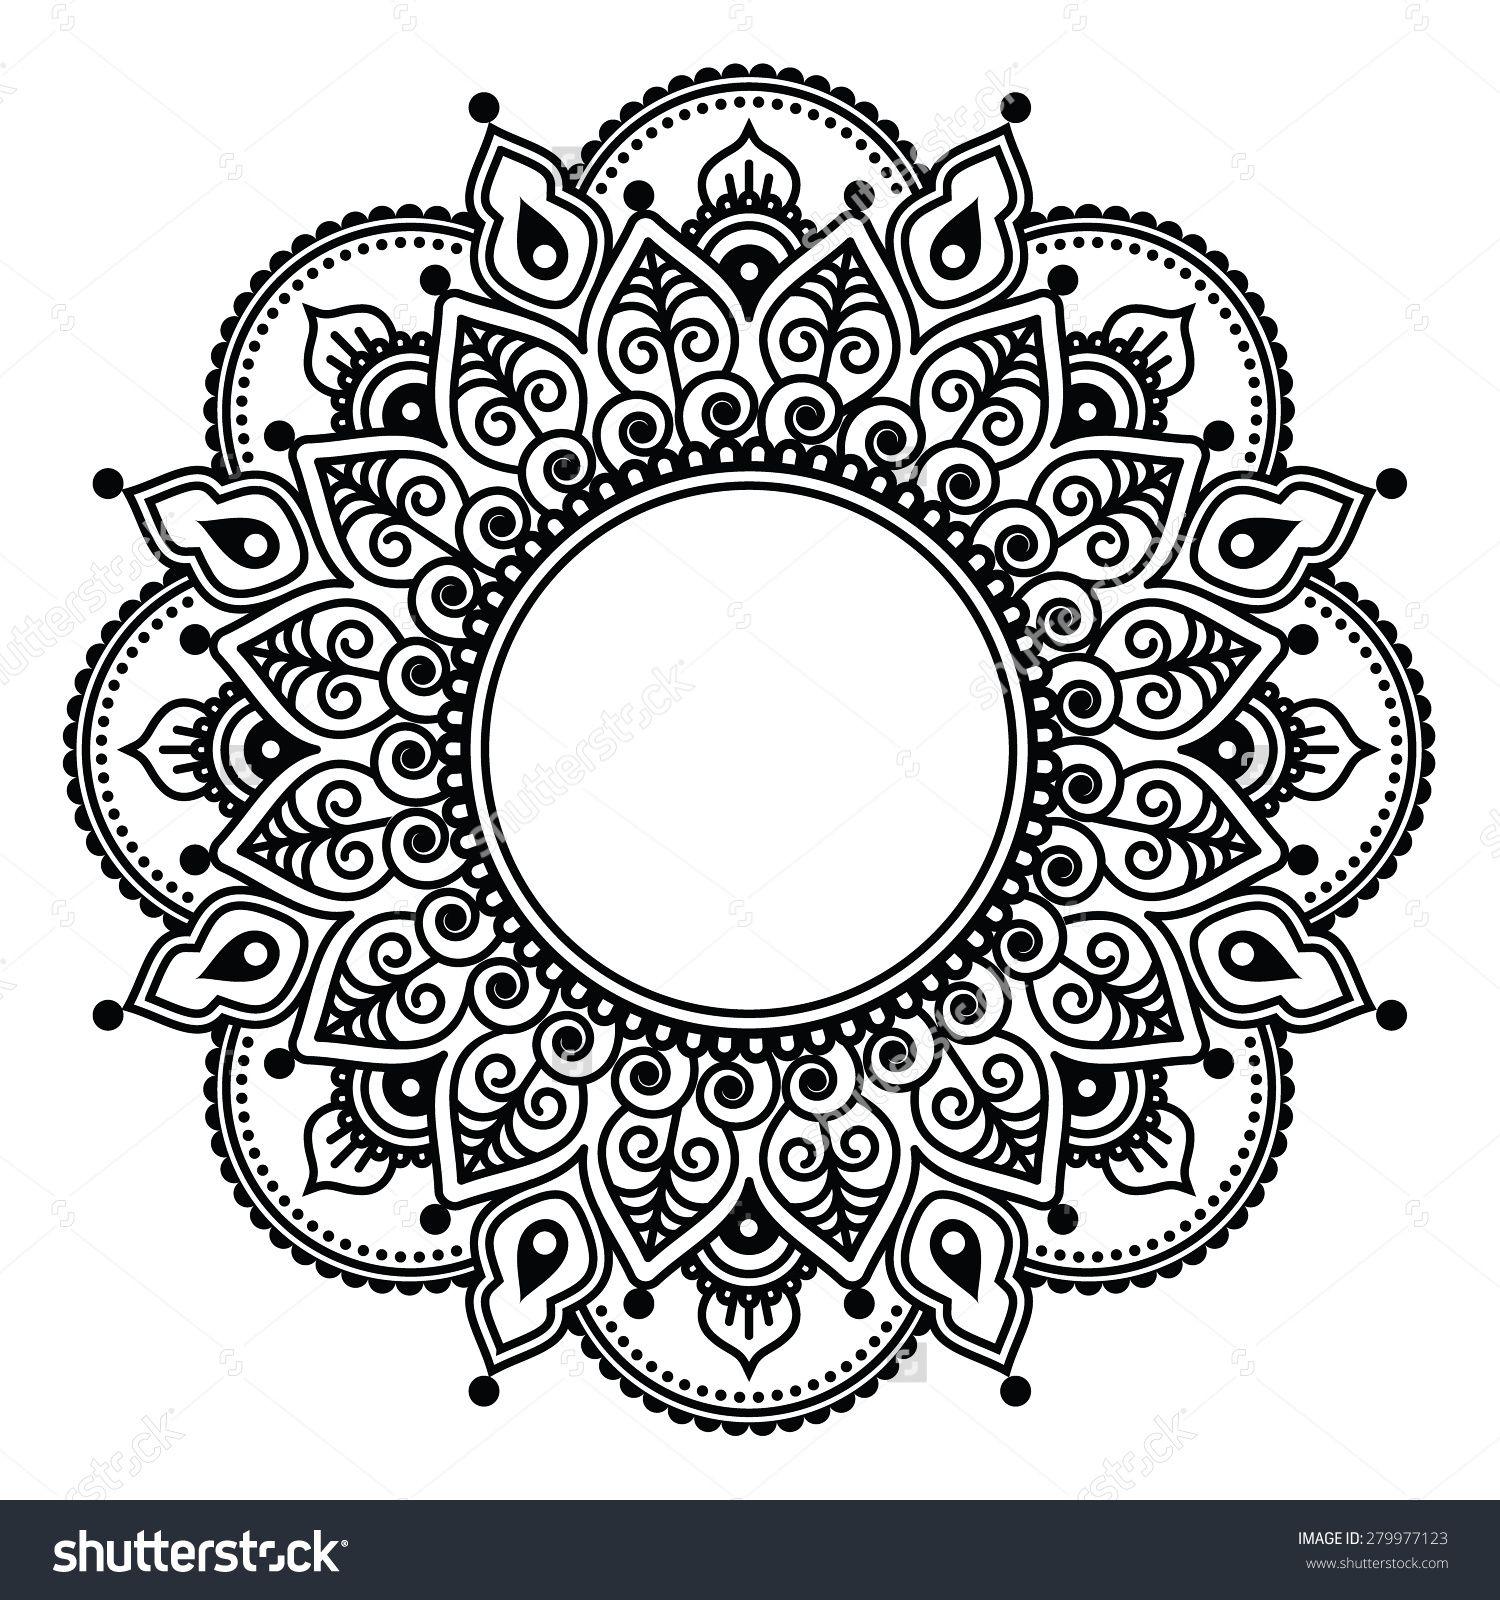 Mehndi Henna Symbols : Symbols mehndi pesquisa google tatoo henna pinterest